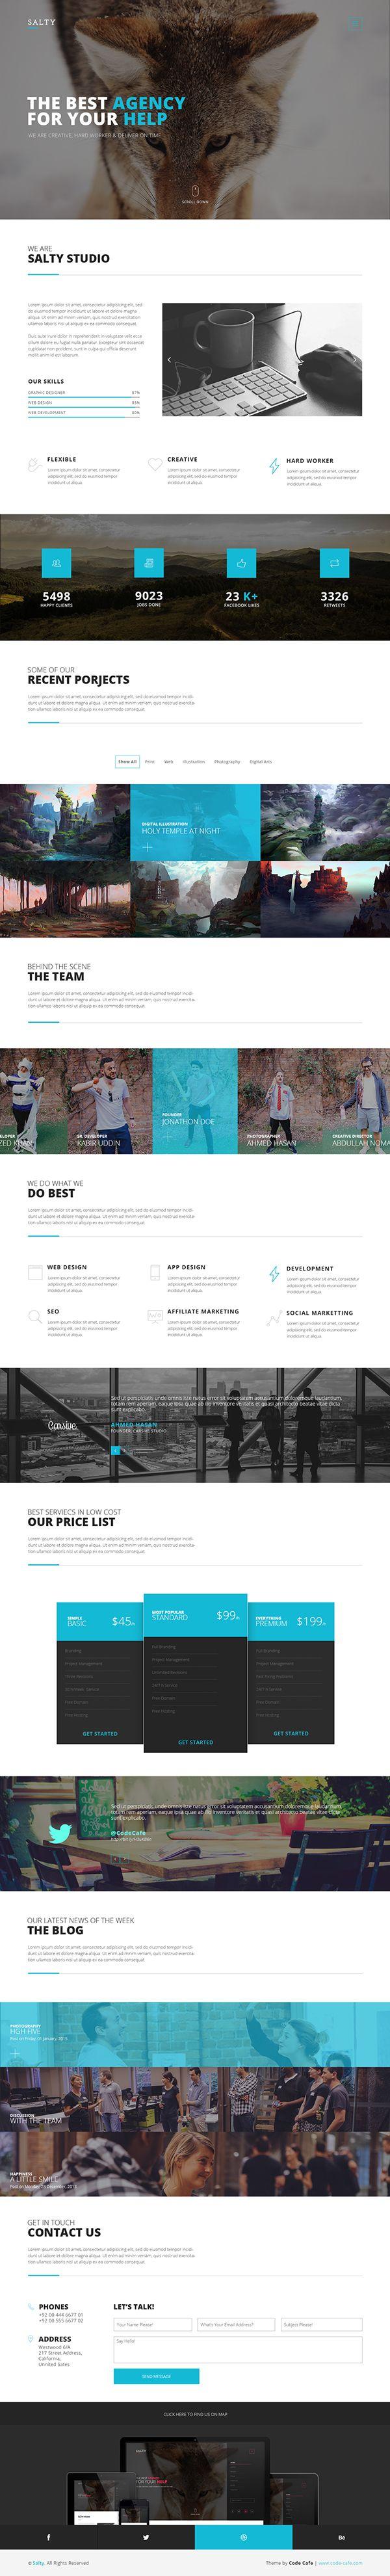 Salty - A creative digital agency & portfolio template on Behance